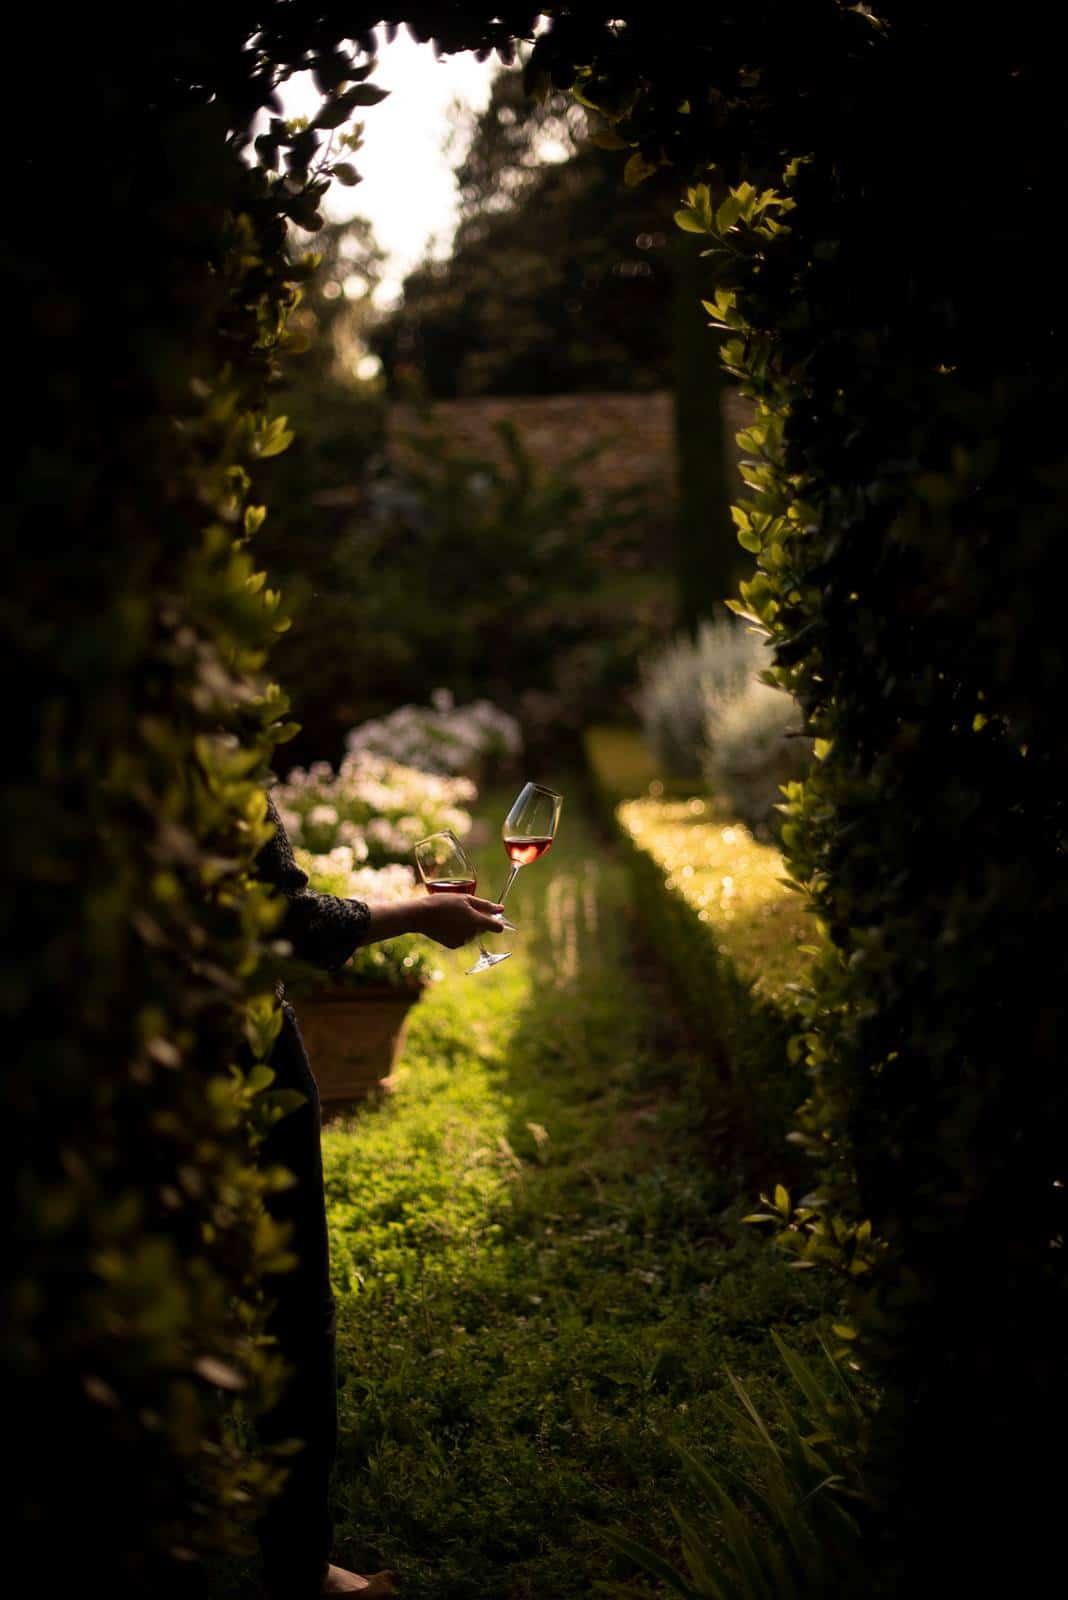 Jardin domaine de la bégude Bandol